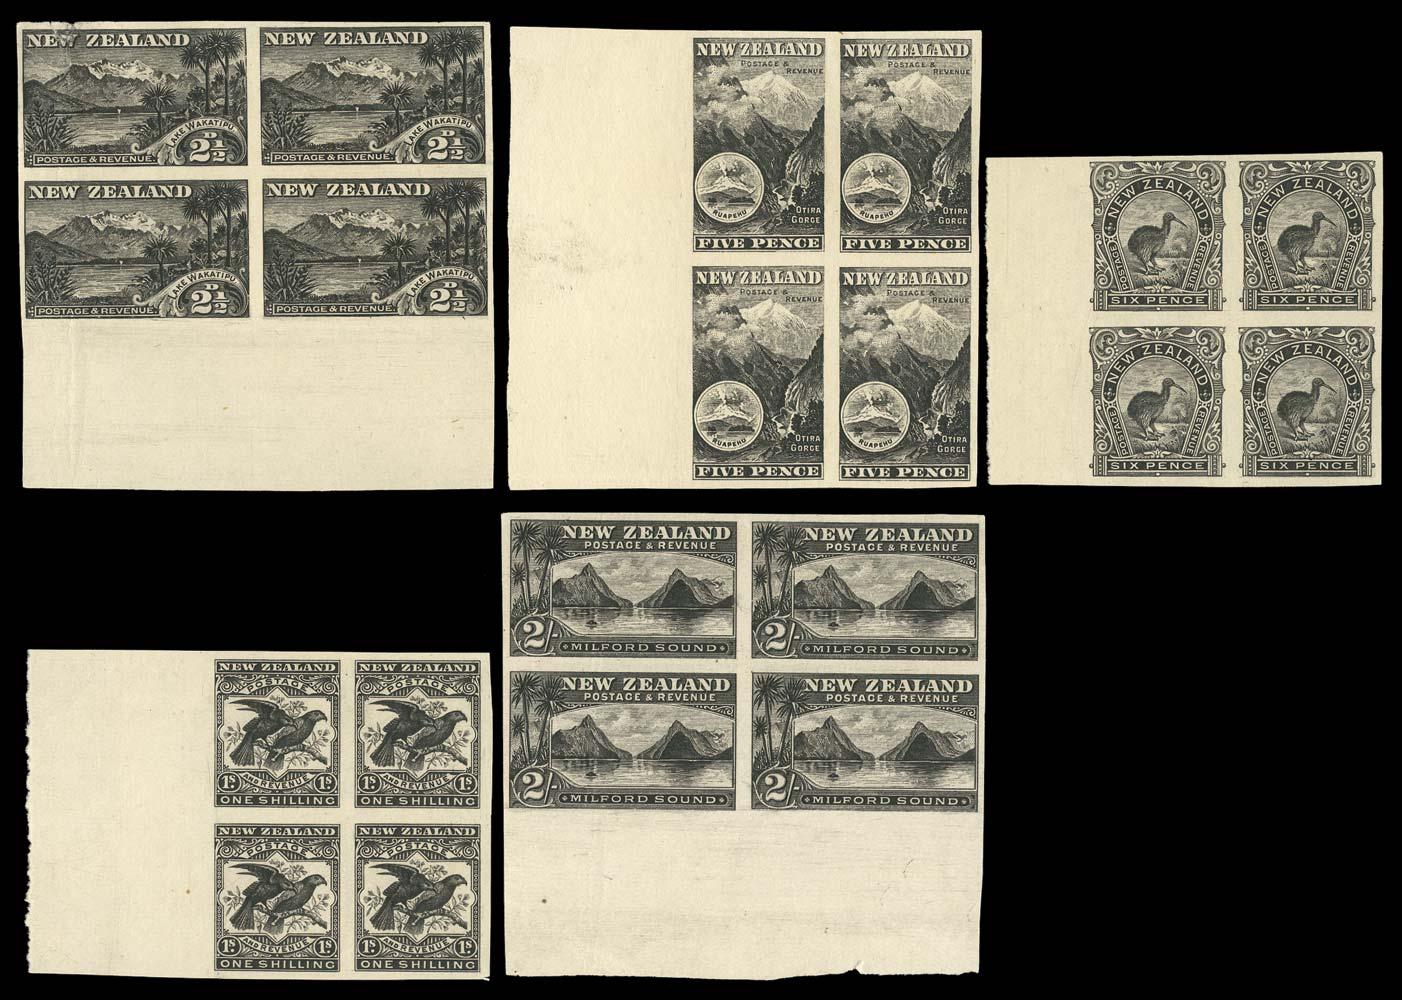 NEW ZEALAND 1899-1900  SG260/9 Proof